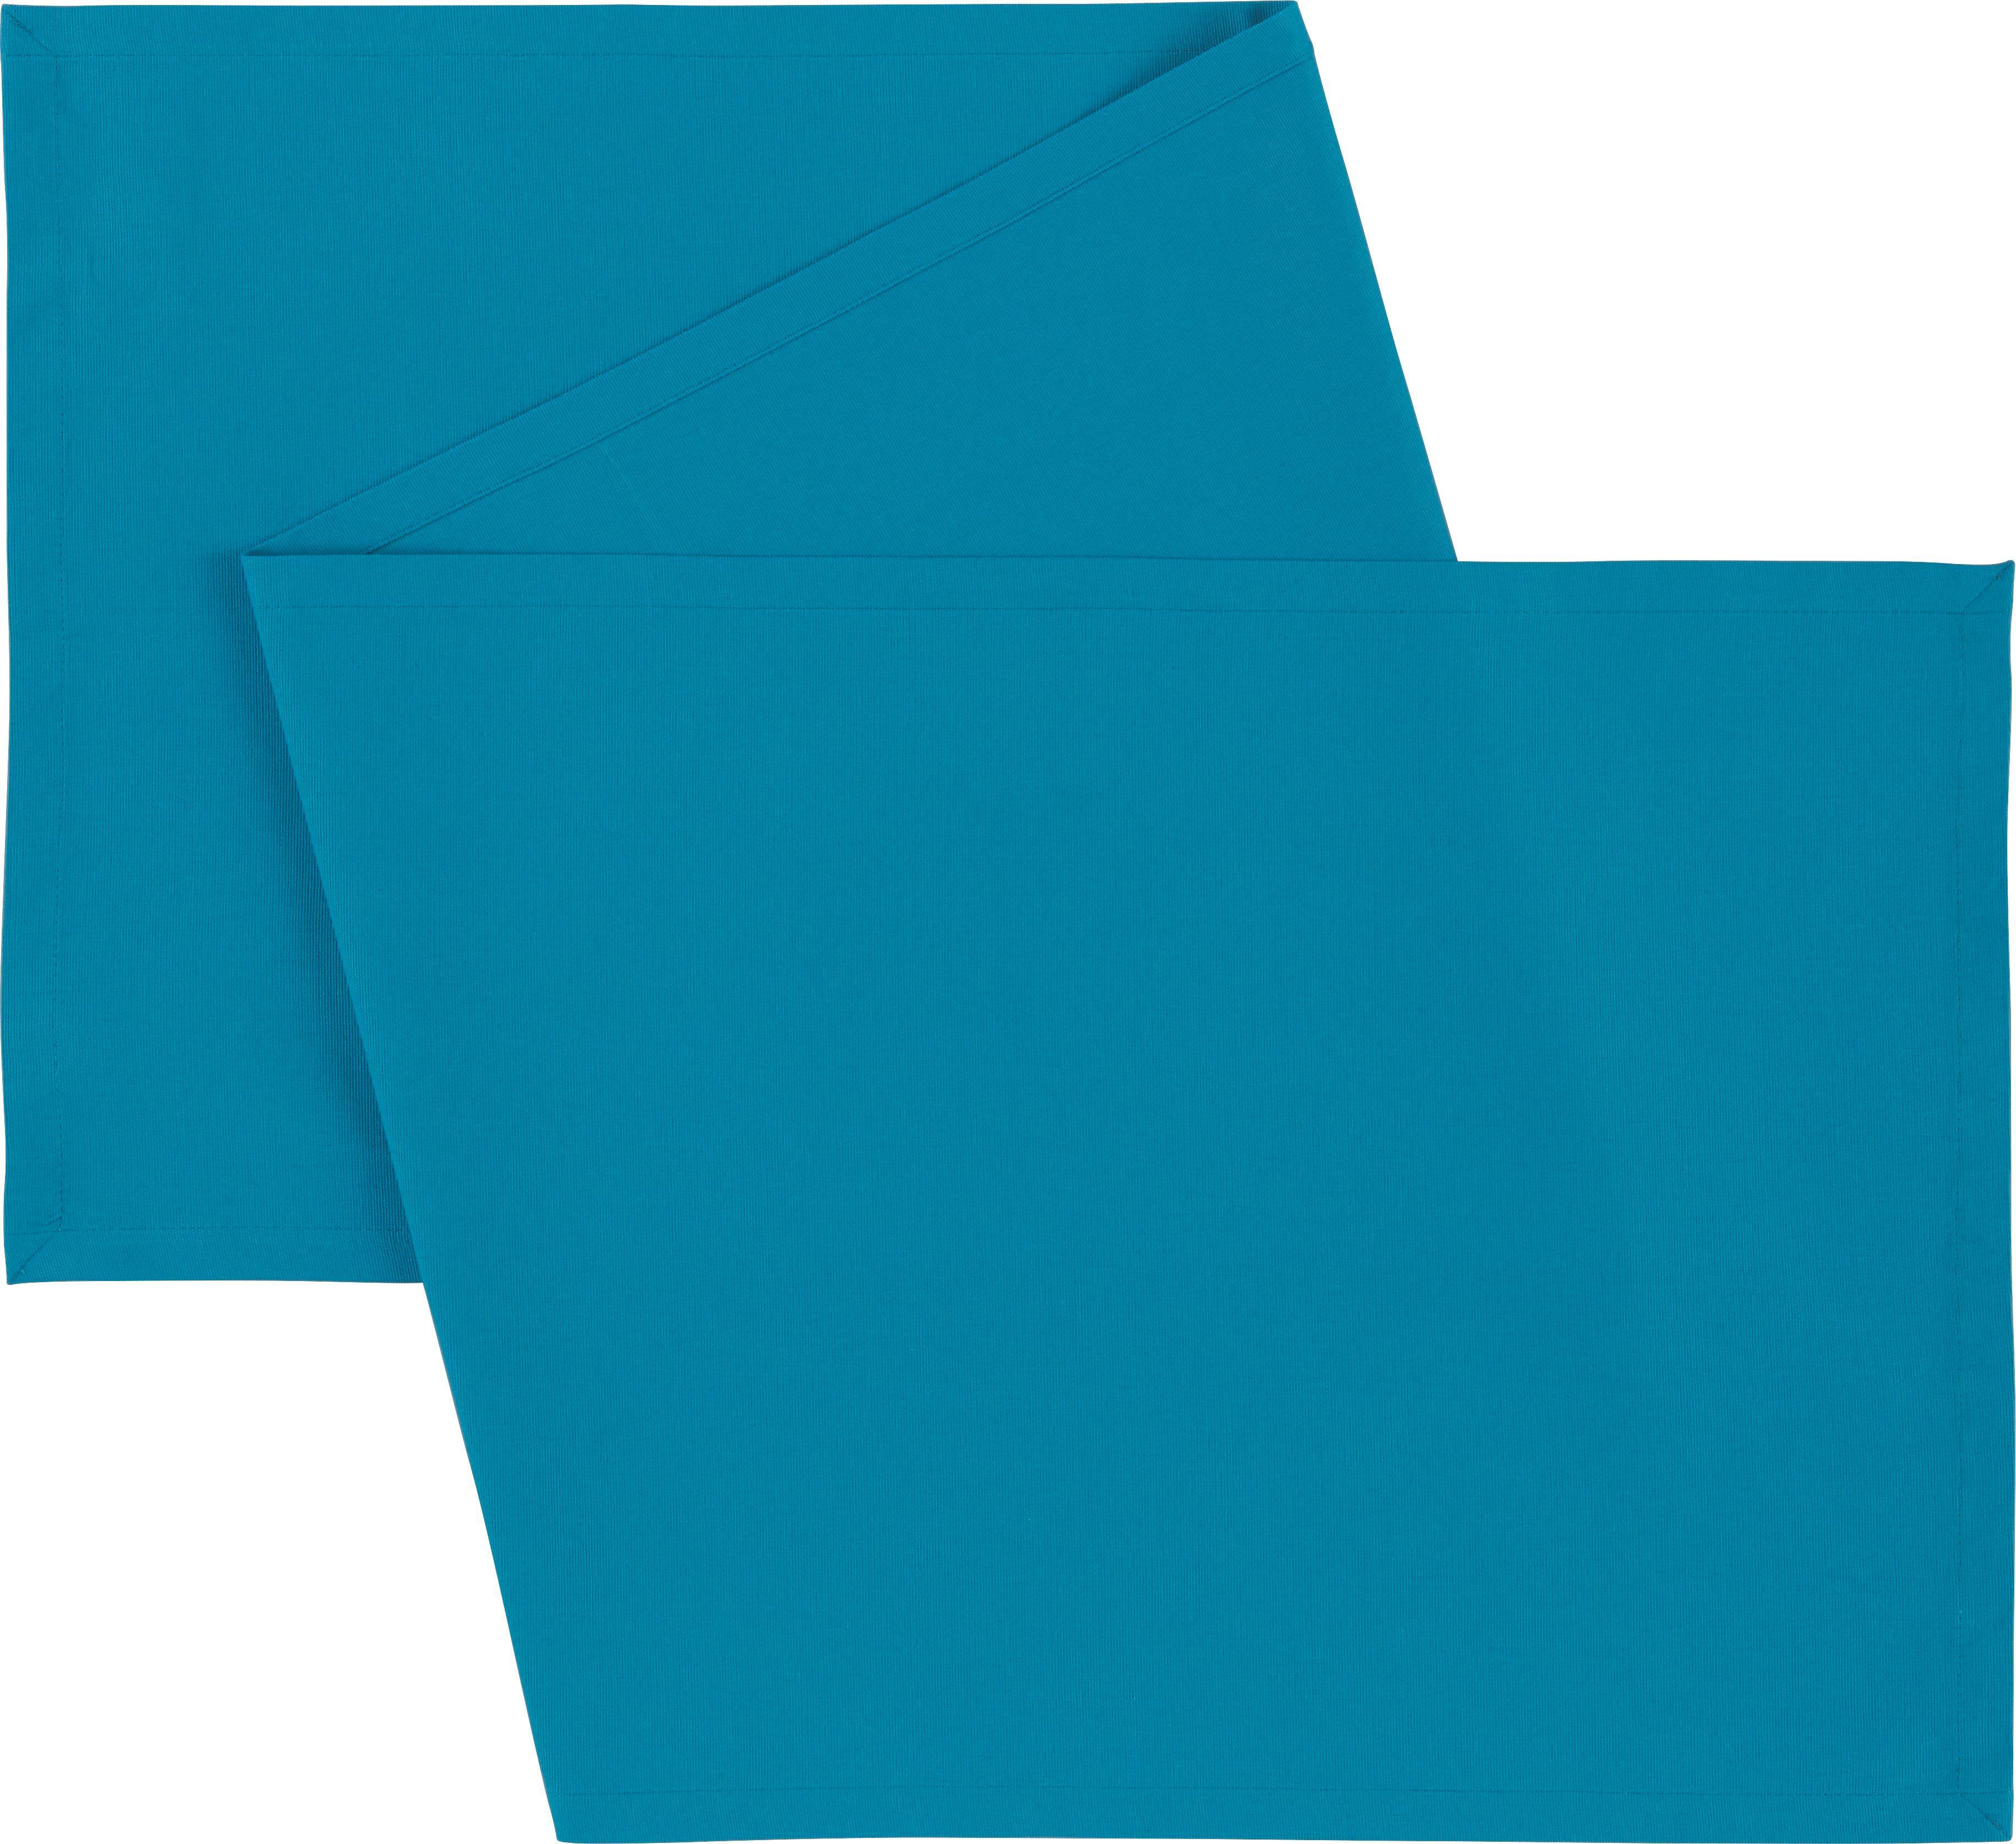 Tischläufer Steffi in Petrol - Petrol, Textil (45/150cm) - MÖMAX modern living